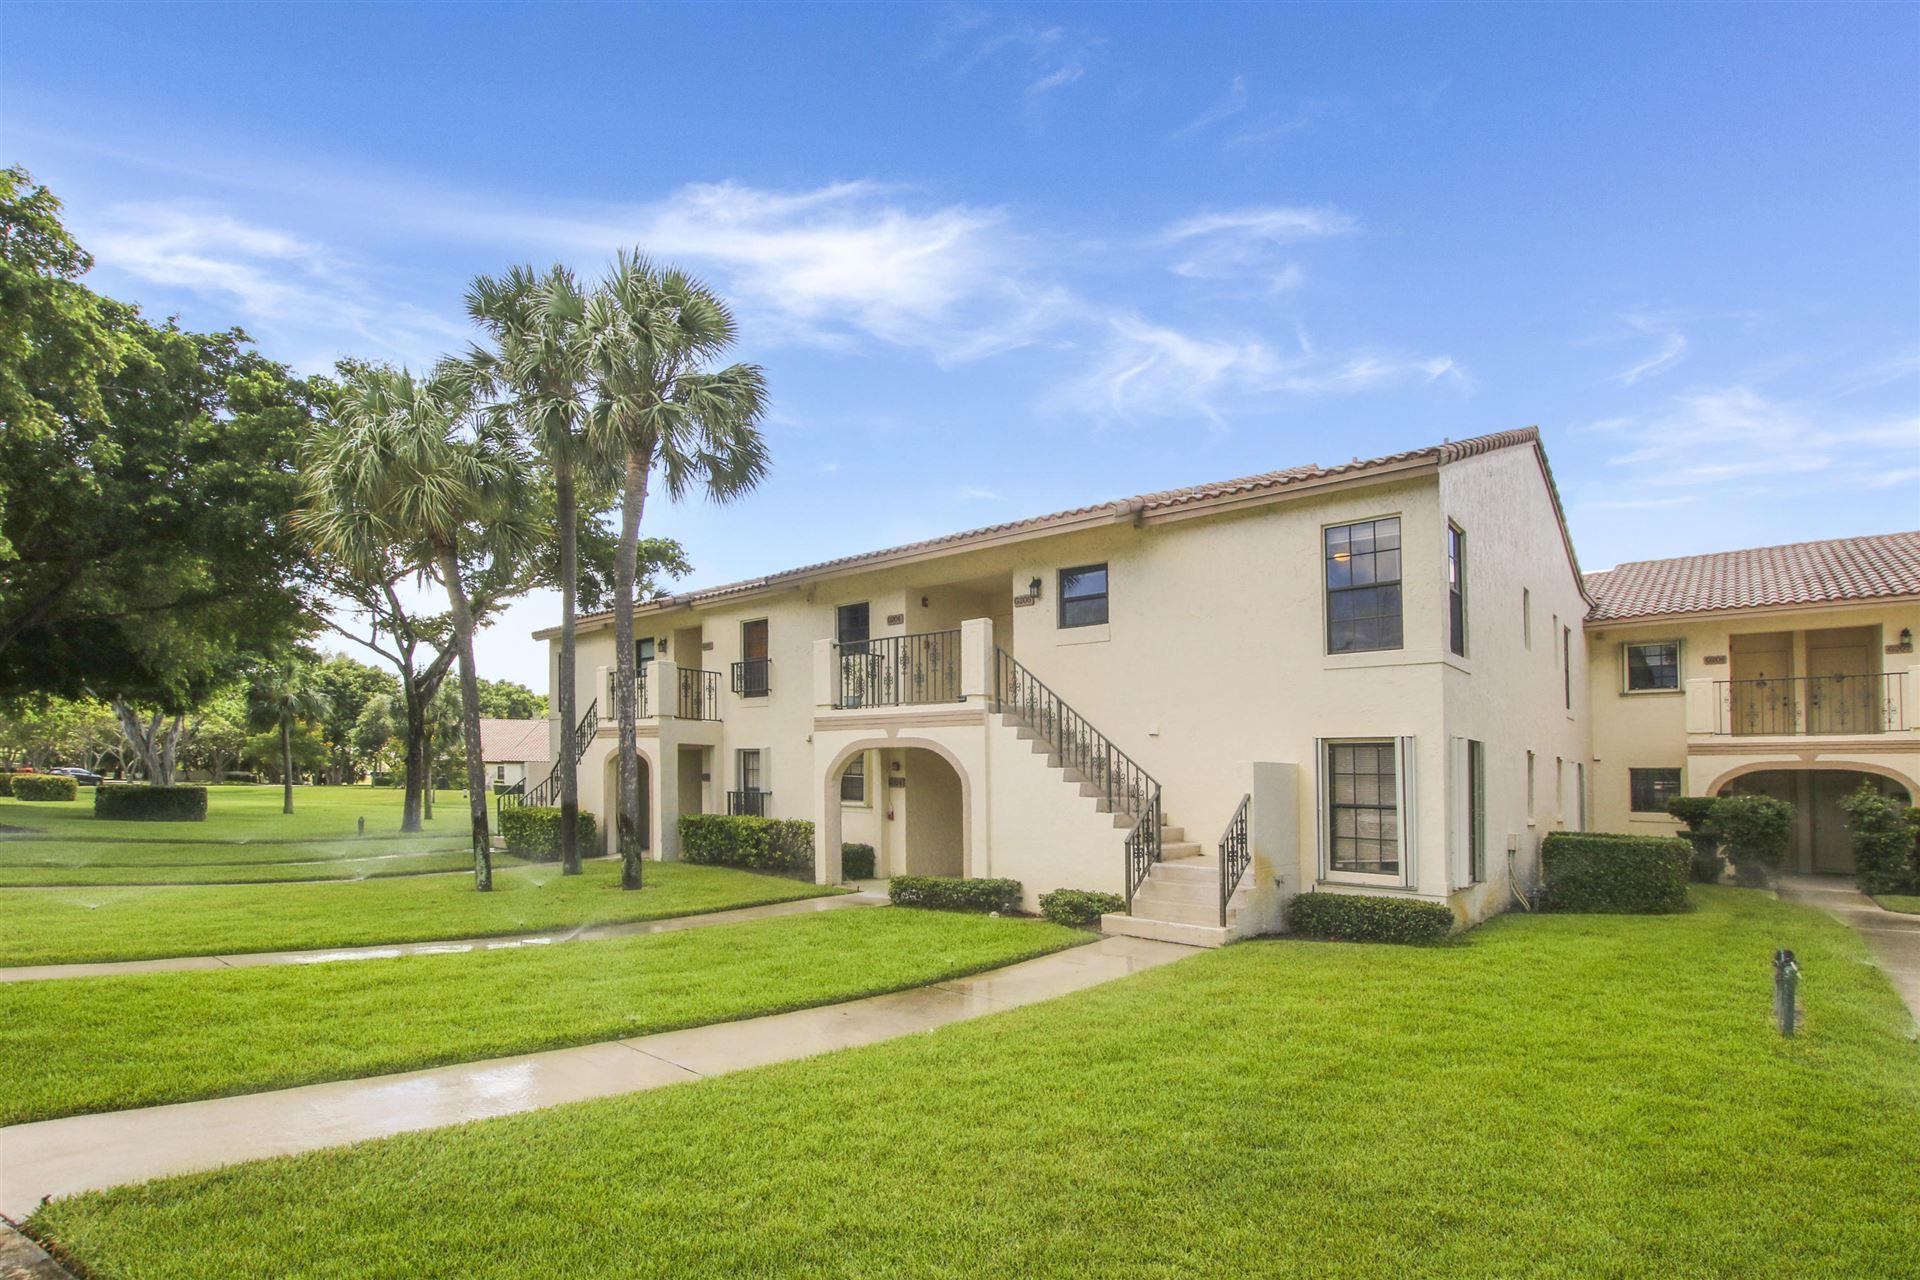 2600 Greenwood Terrace #205, Boca Raton, FL 33431 - #: RX-10649627